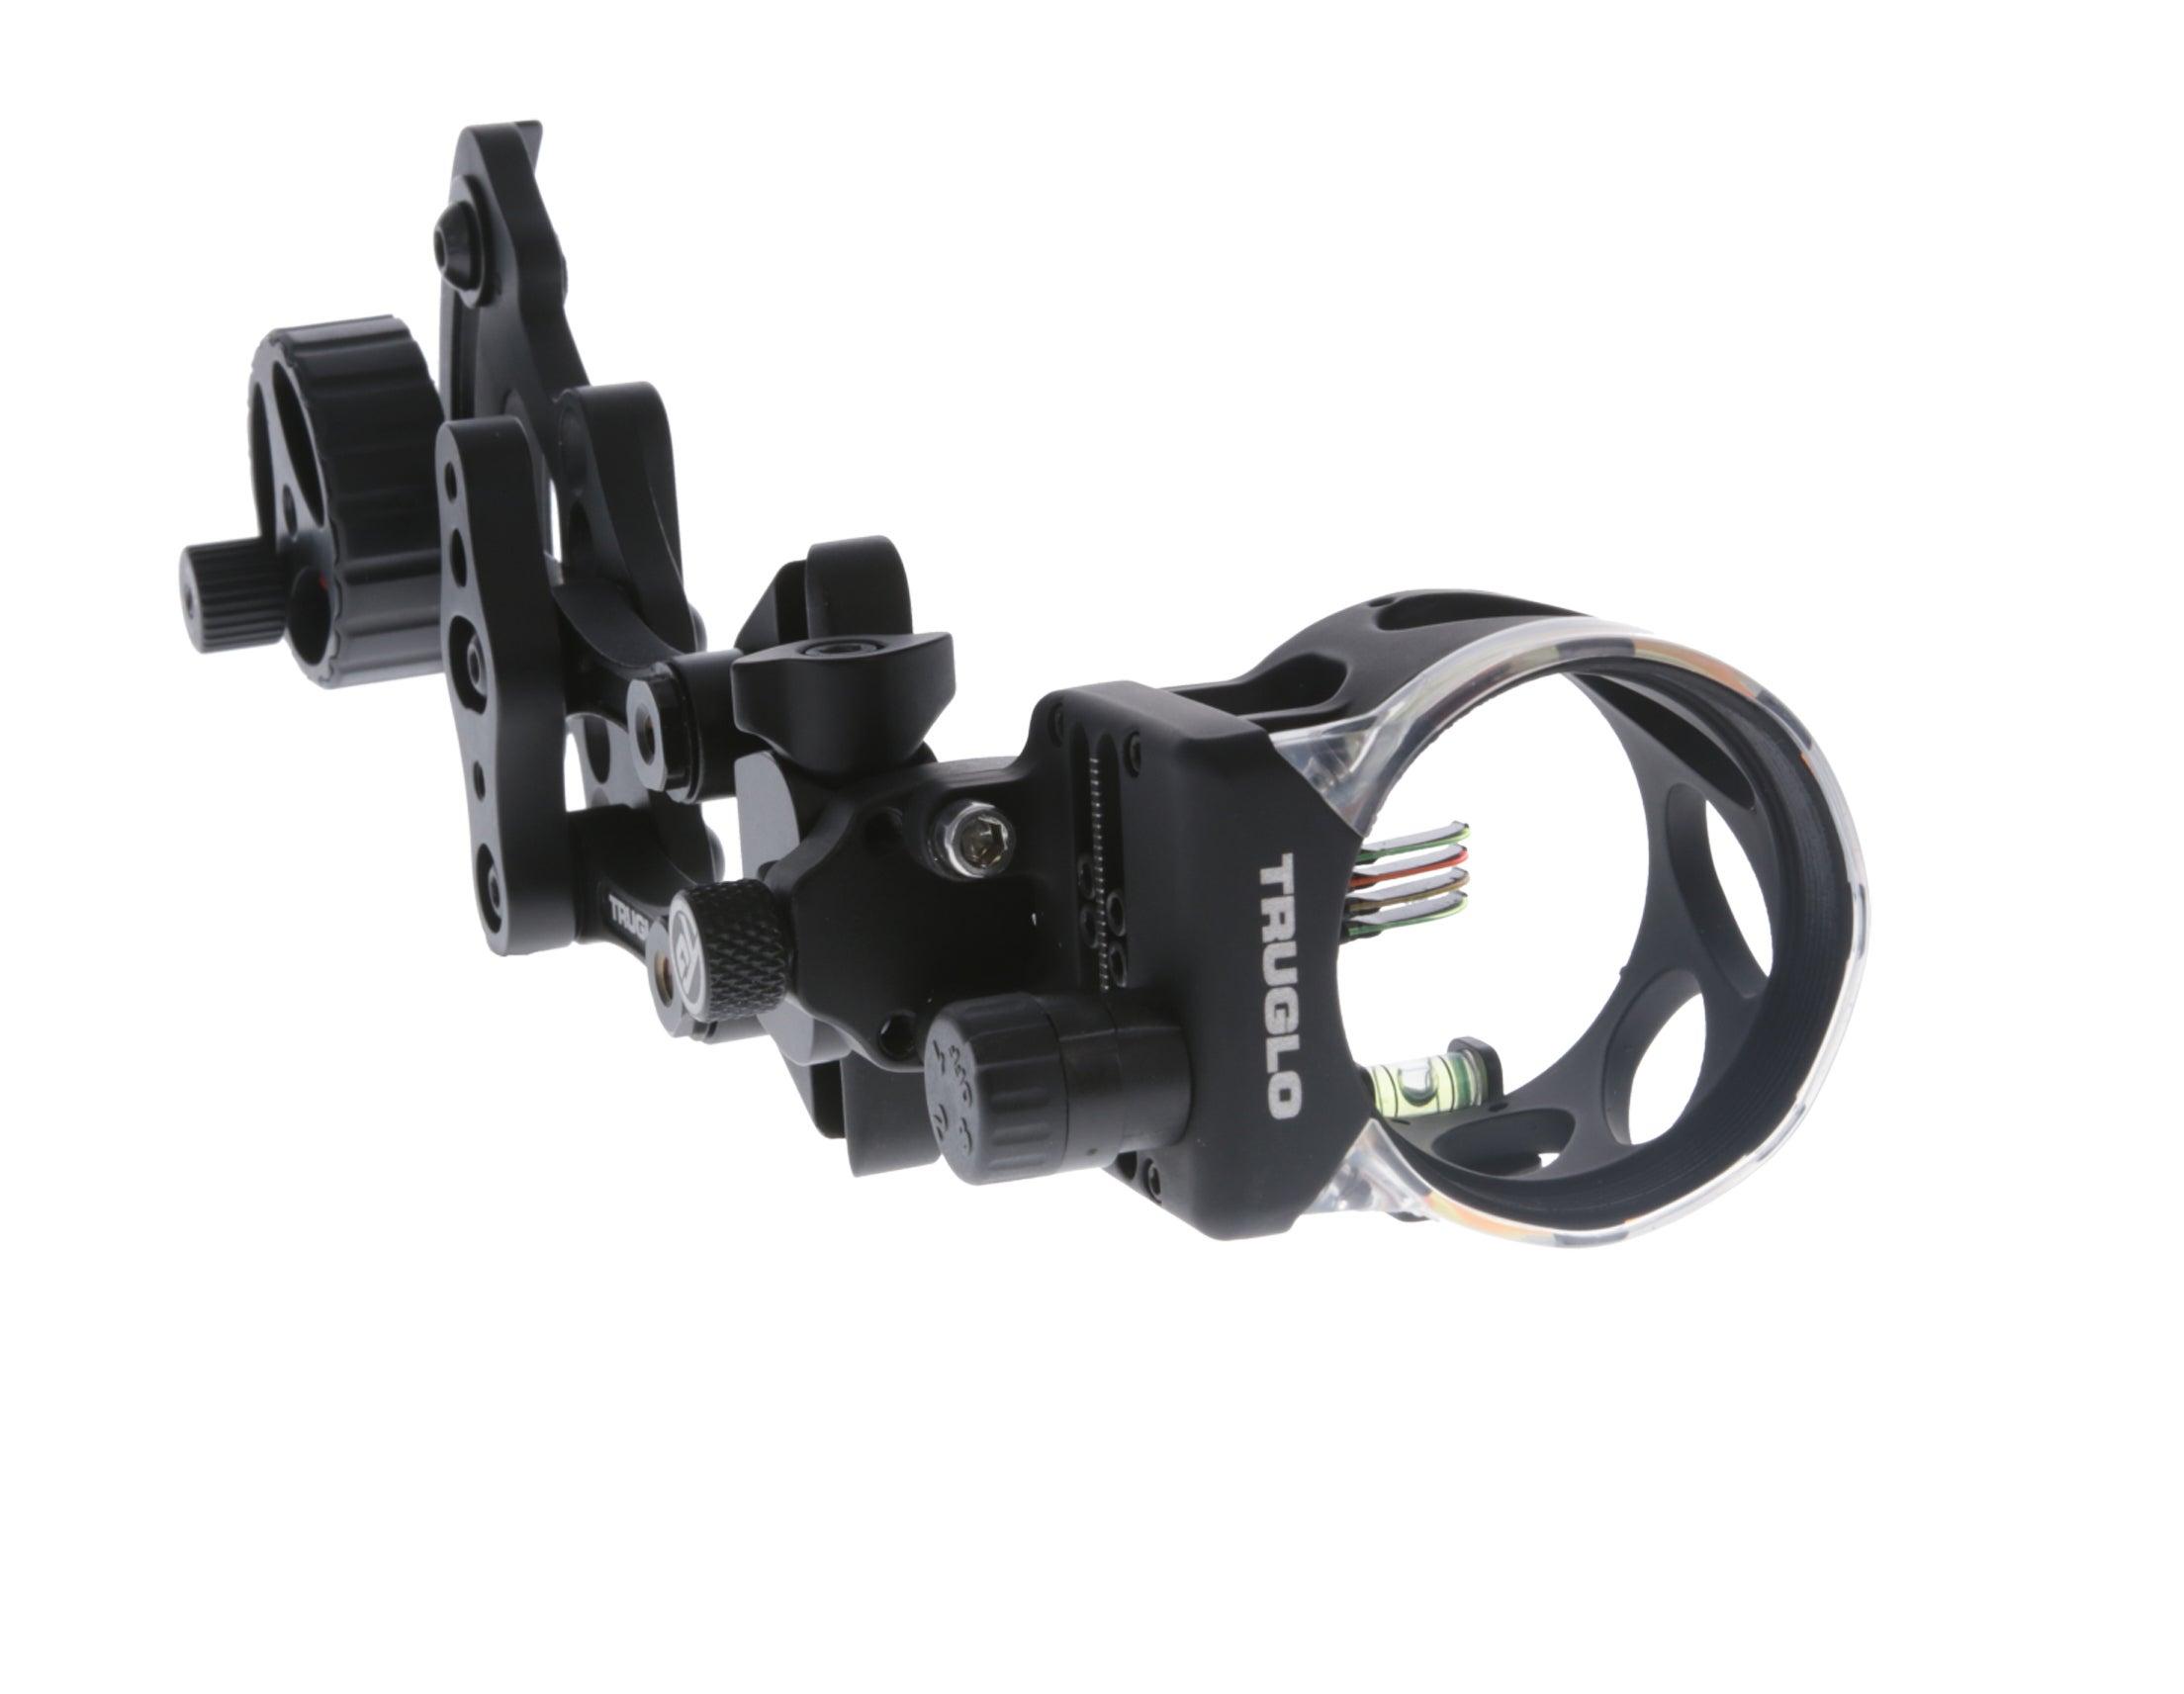 TRUGLO Archers Choice Range Rover M4 bow sight